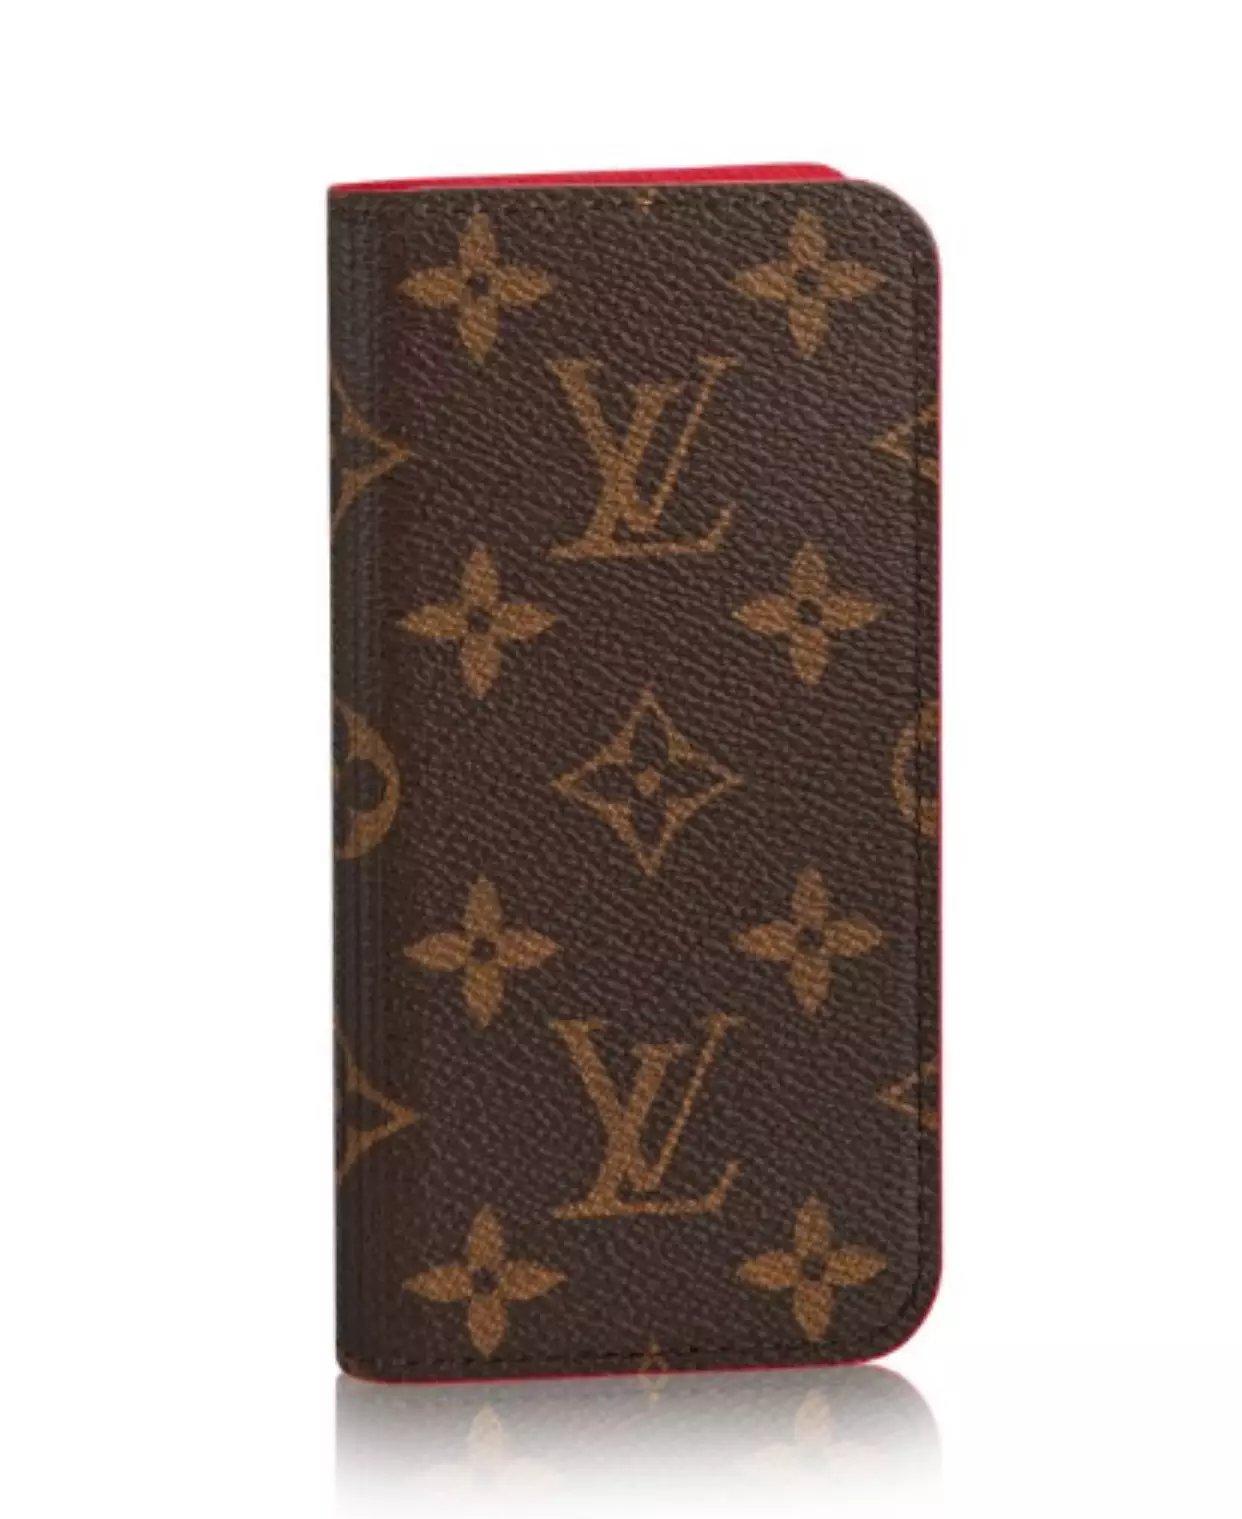 iphone lederhülle edle iphone hüllen Louis Vuitton iphone6s hülle iphone ca6s leder handy ca6s iphone 6s 6s iphone hülle htc one handyhülle 6slbst gestalten iphone 6s schale design handyhülle